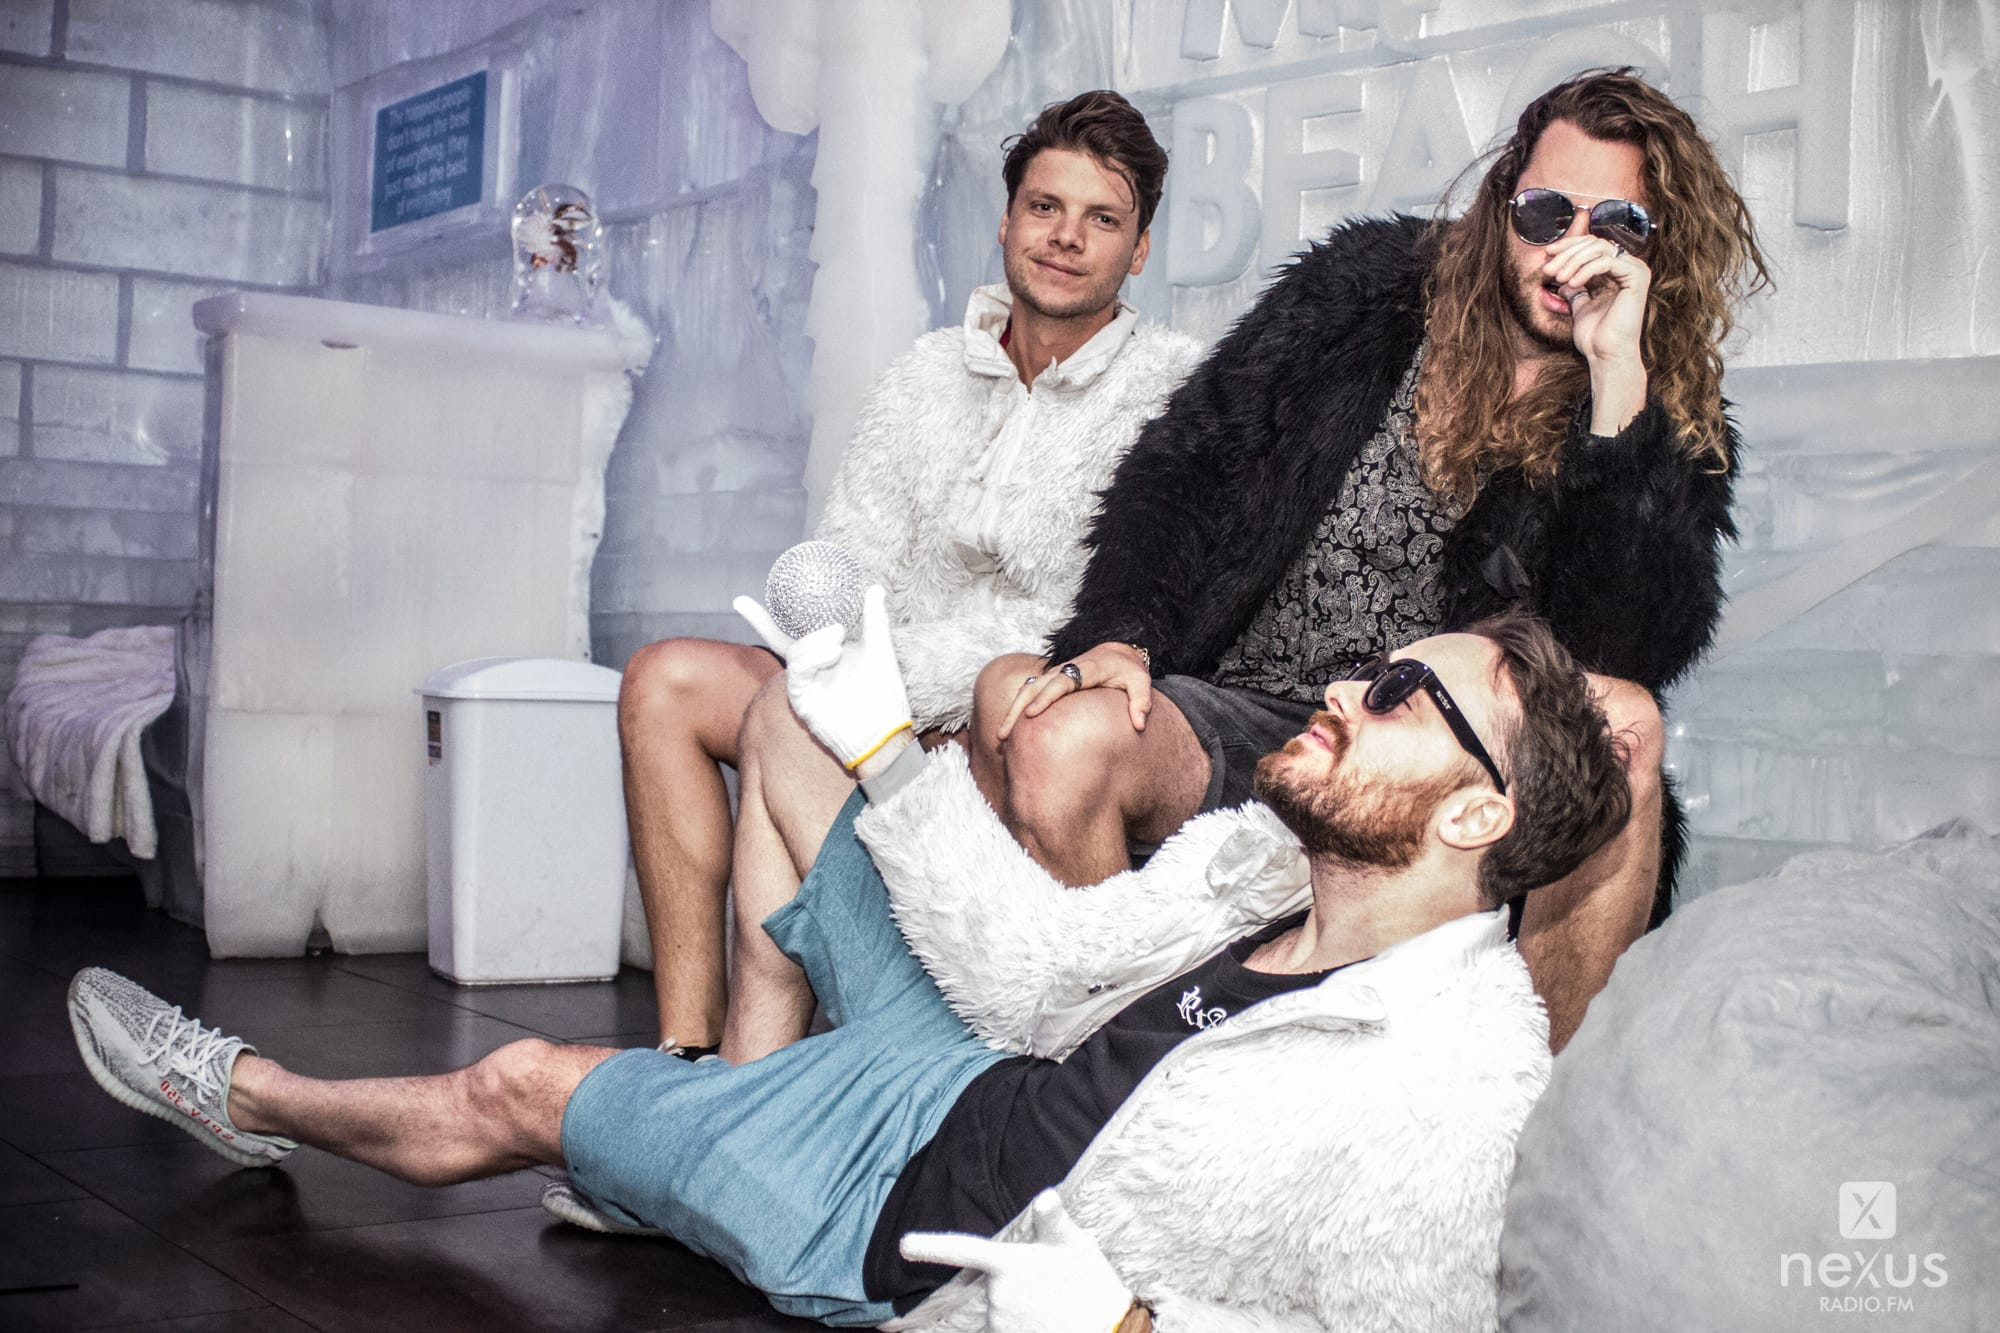 Nexus-Lounge-2018-D1-59